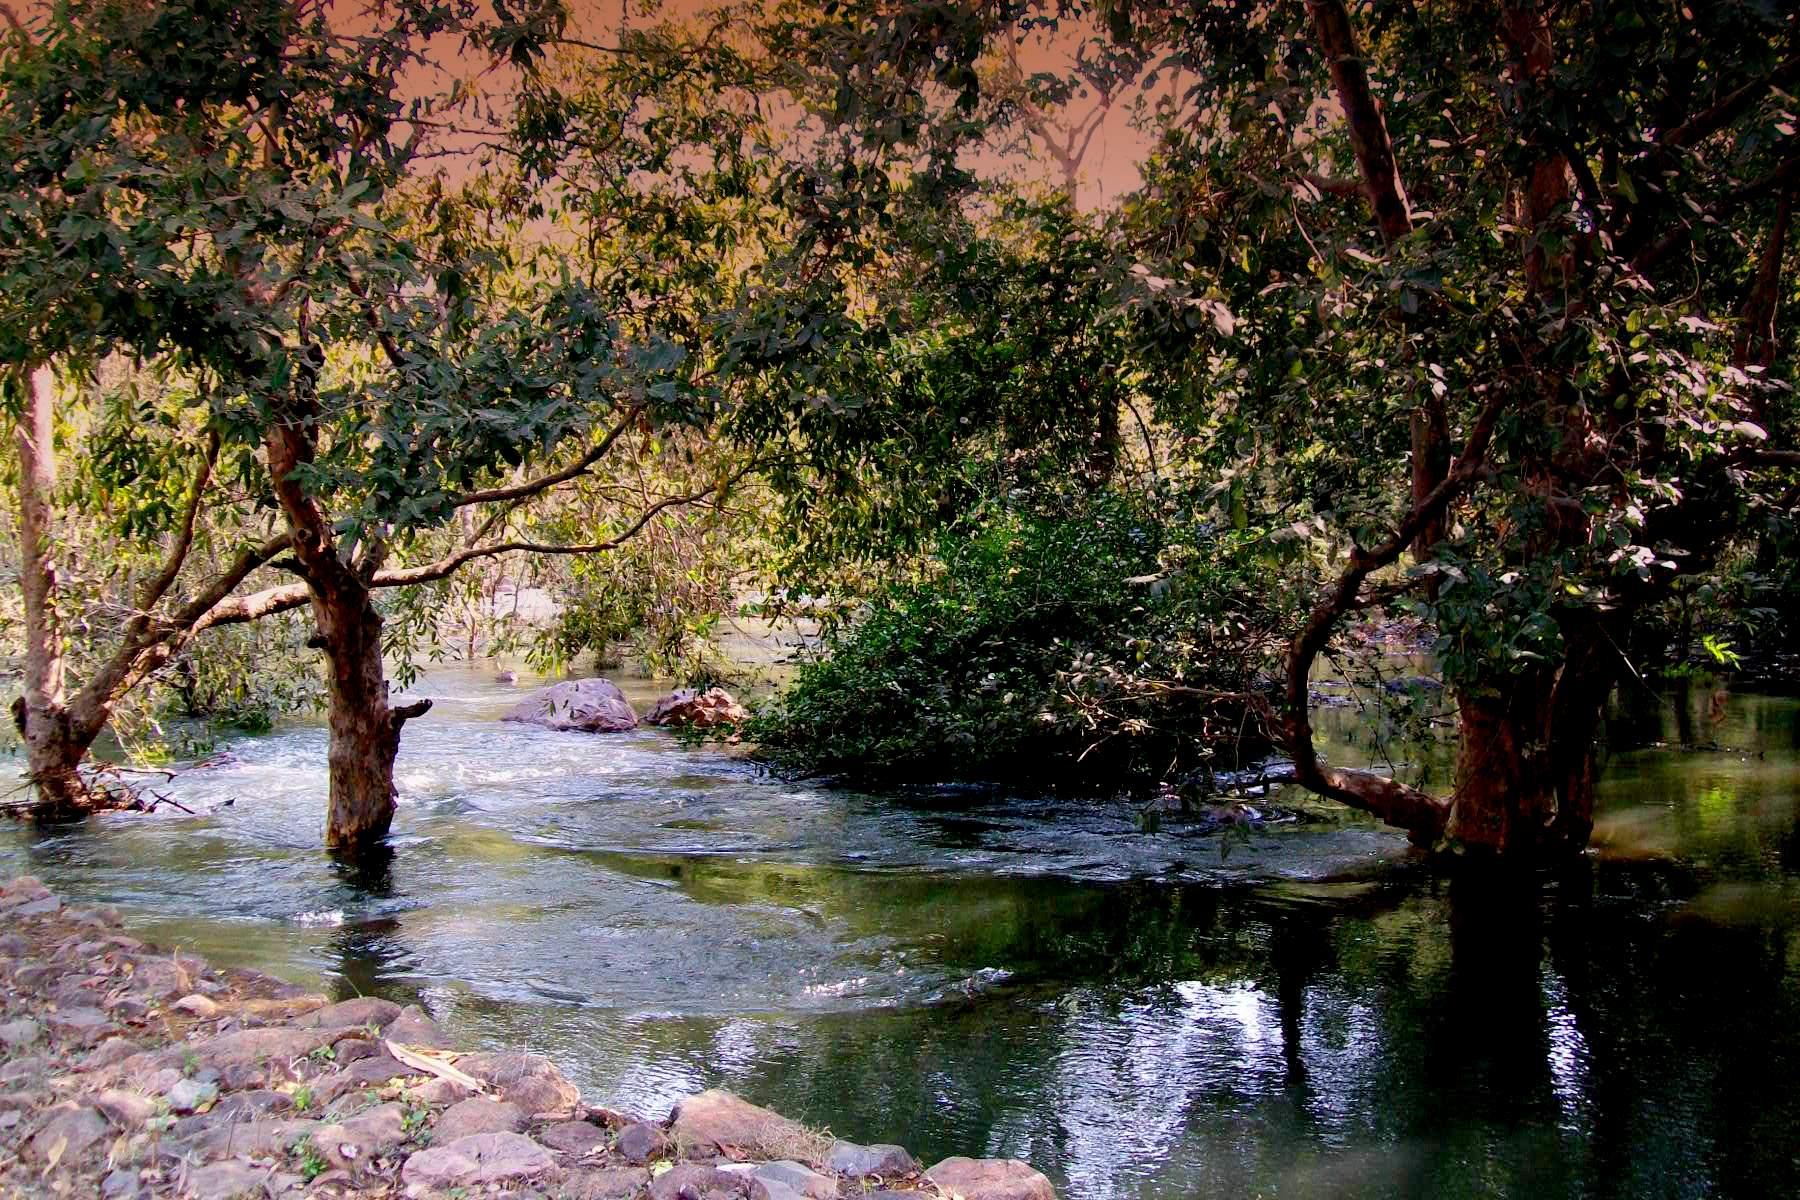 Sita Mata Sanctuary, Pratapgarh